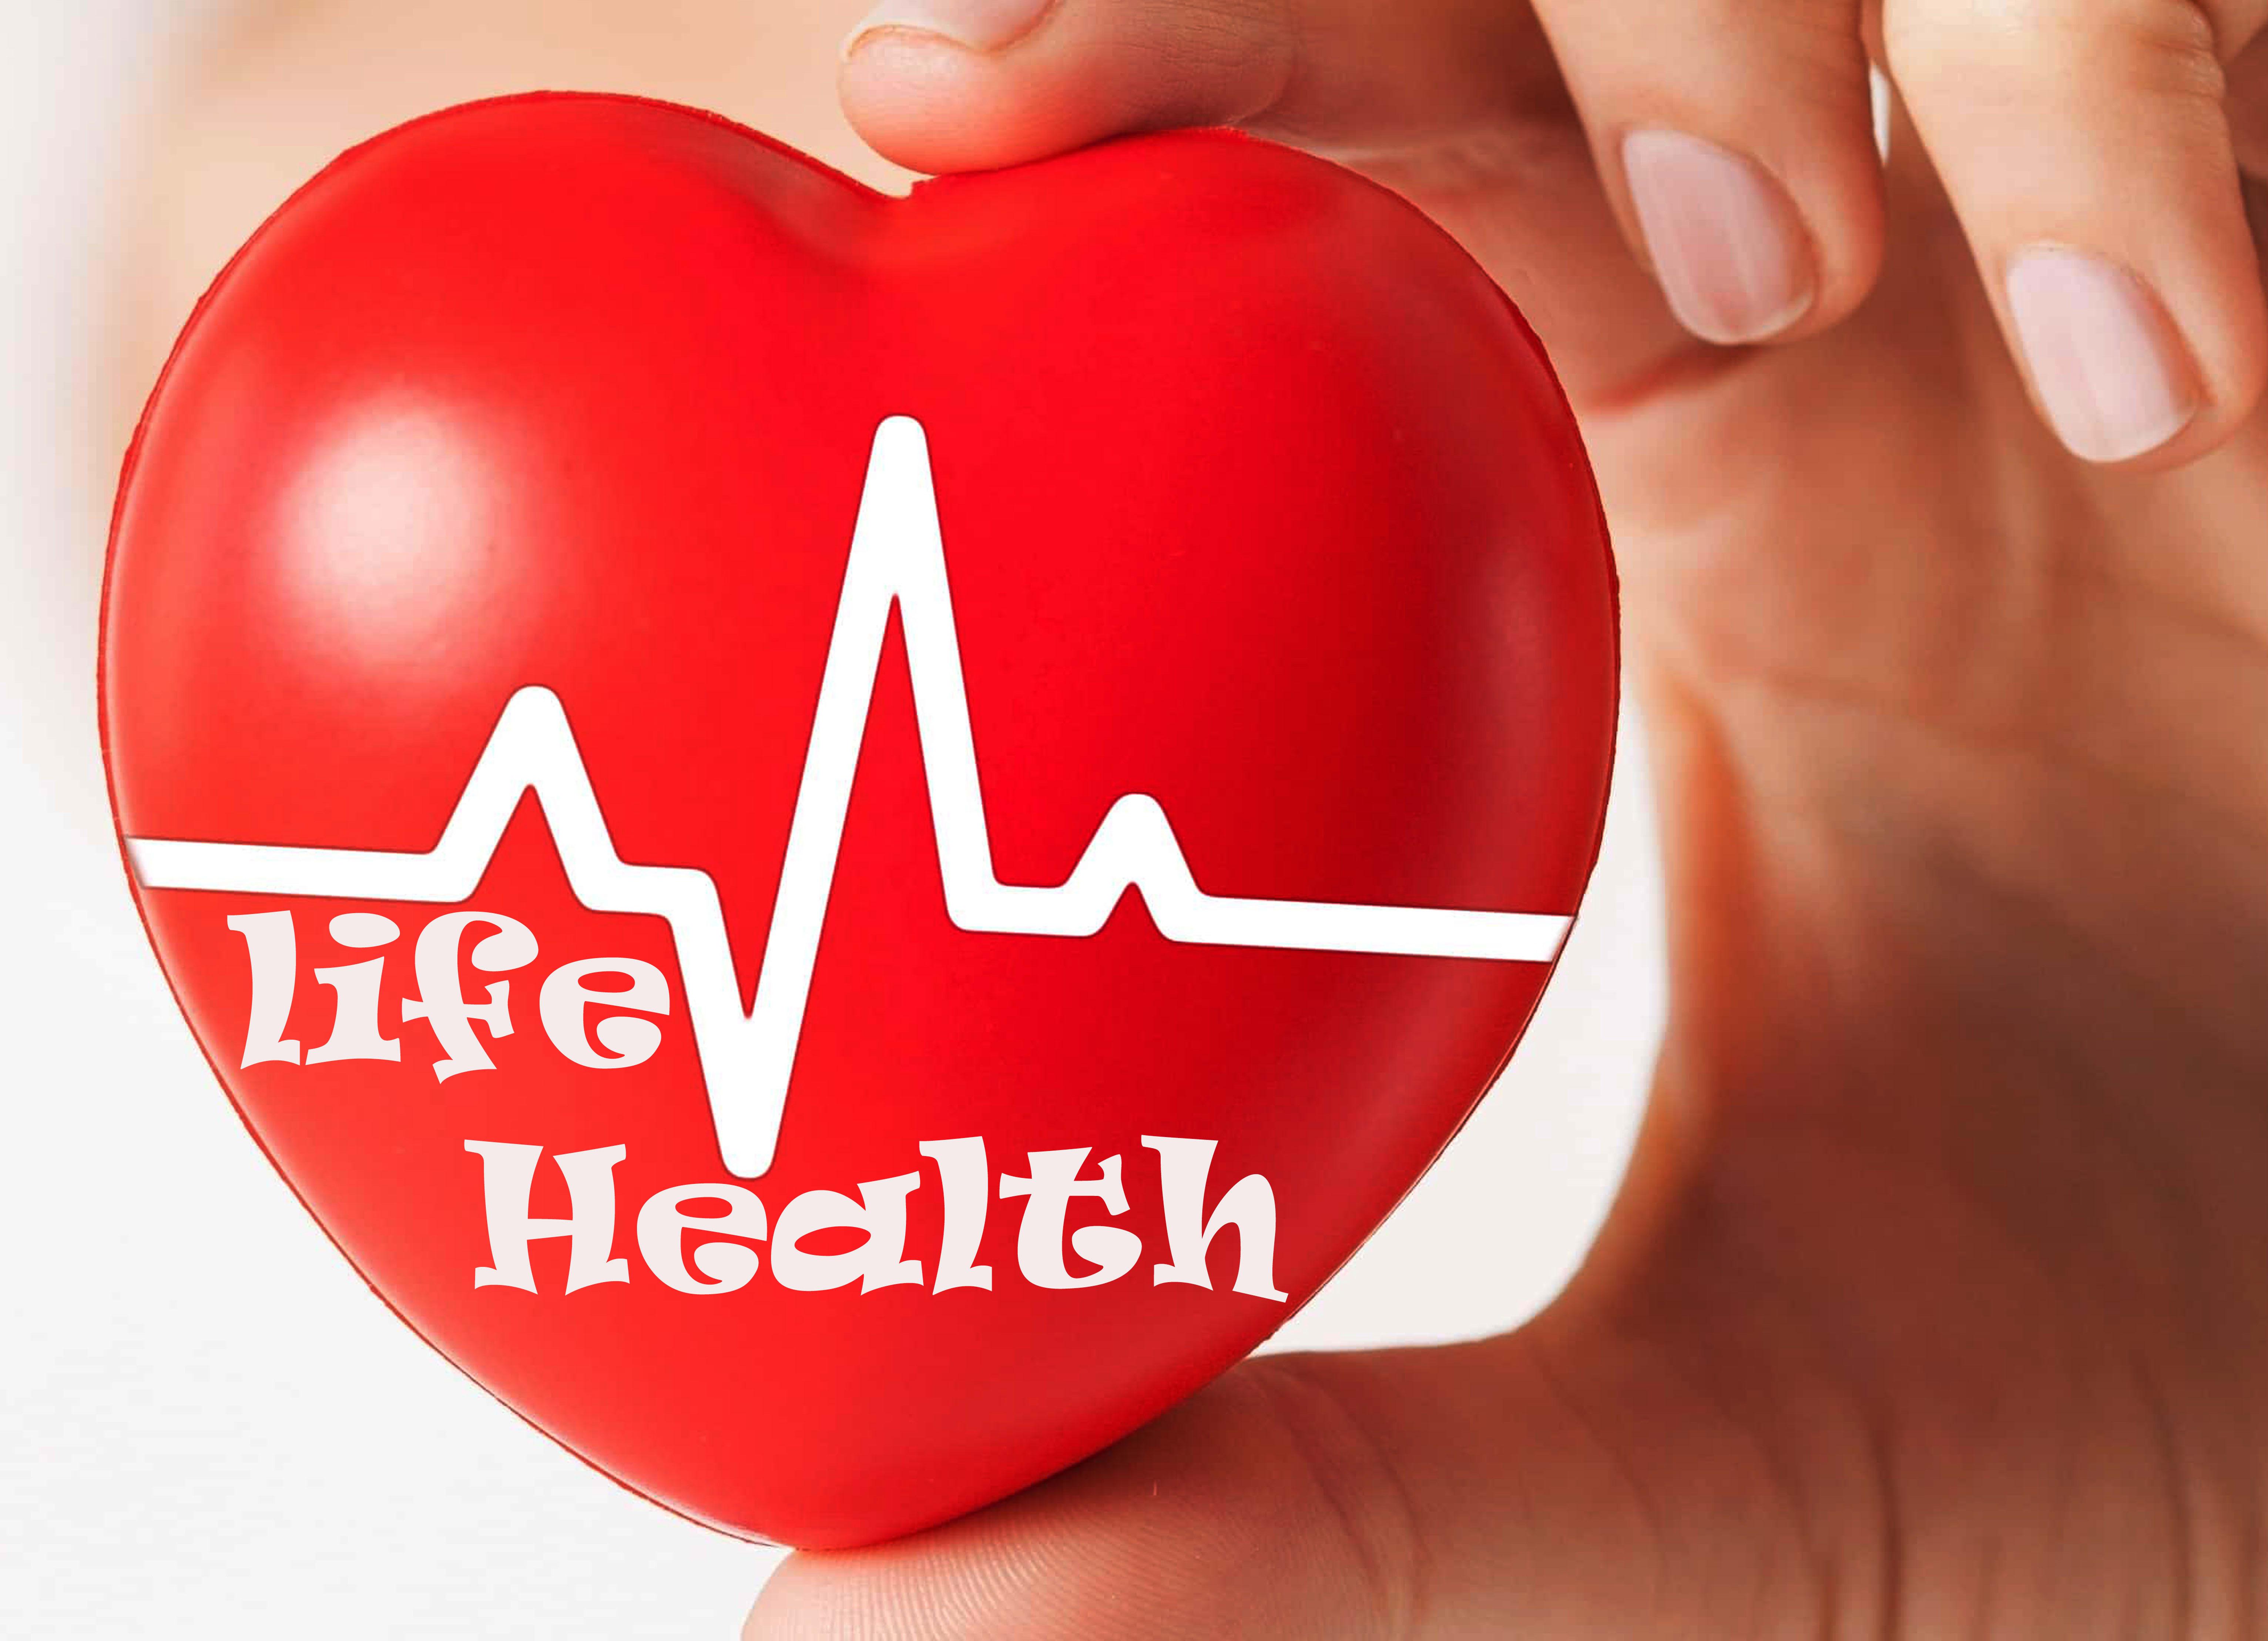 Lifevshealth